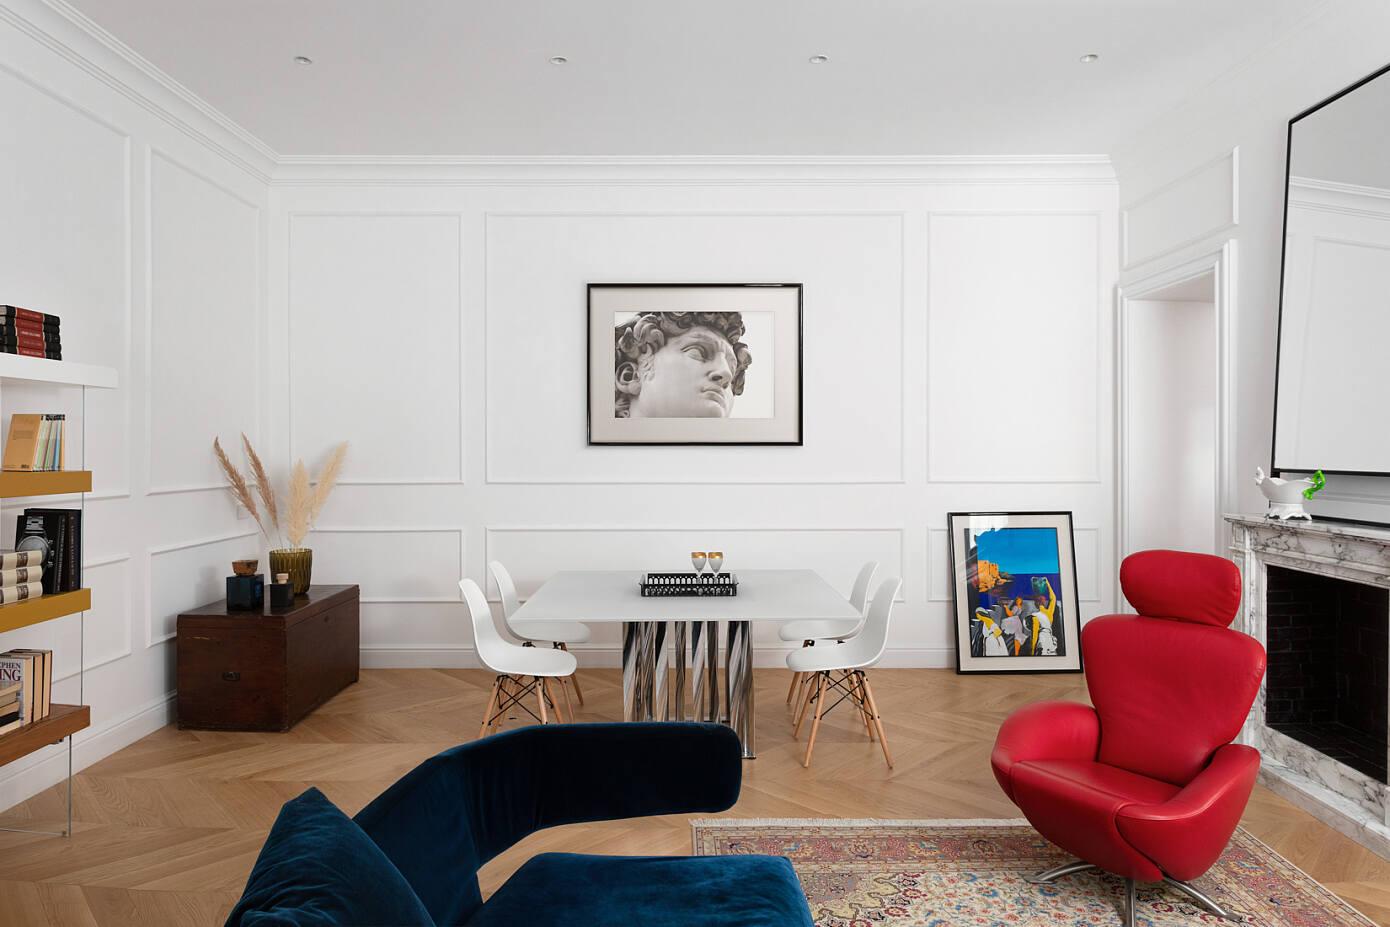 Casa Capoluongo by Fadd Architects